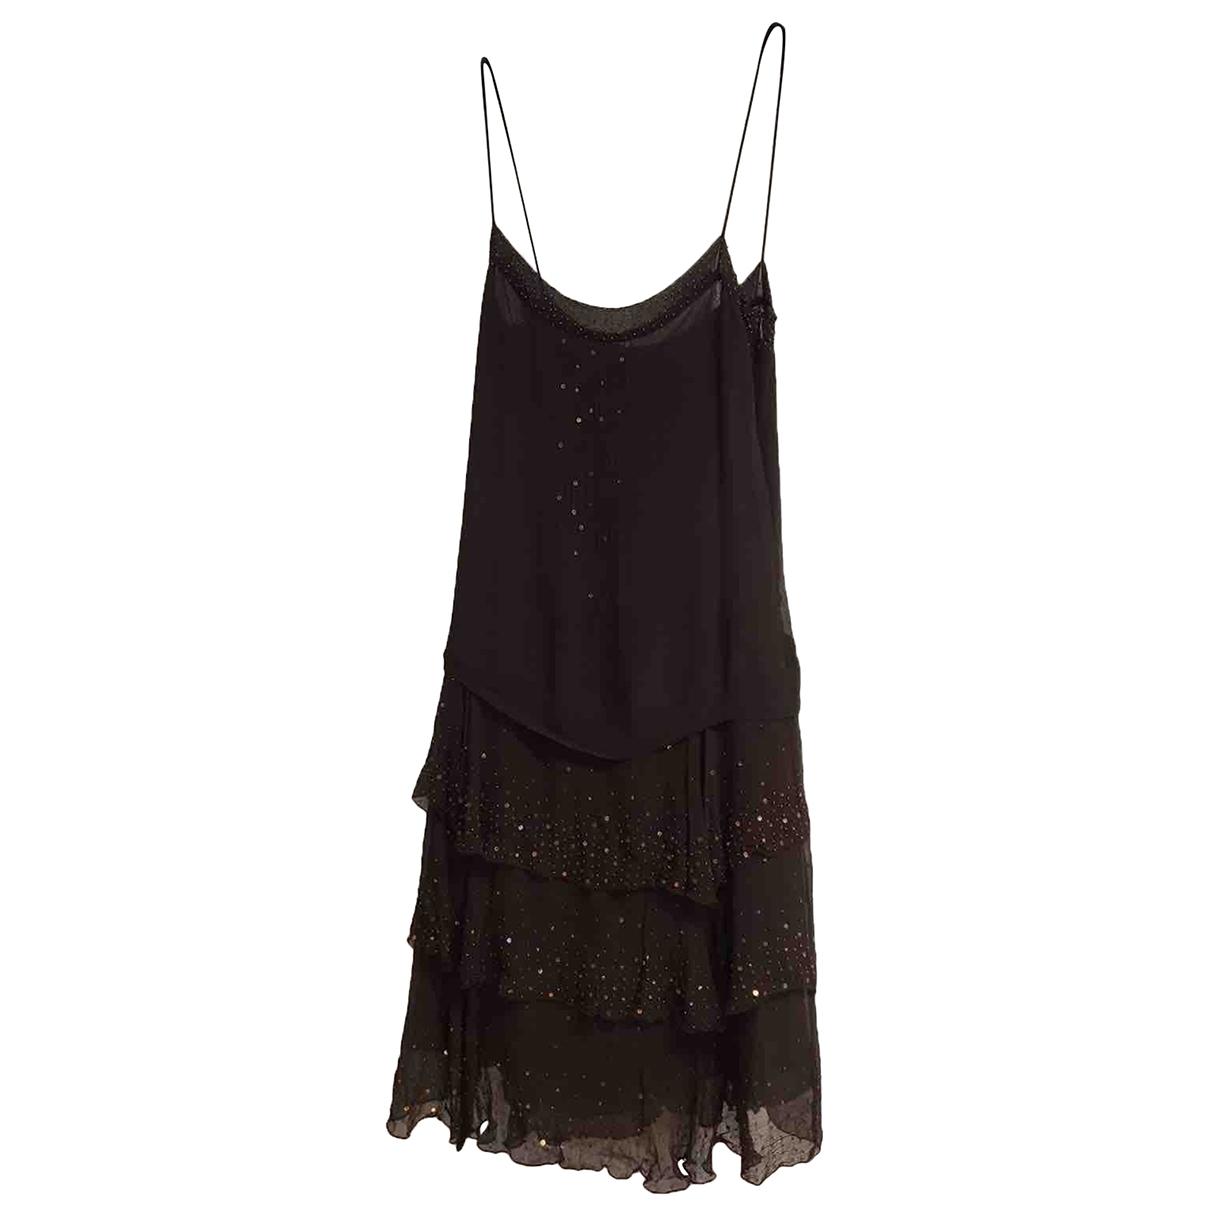 Zara \N Brown Silk dress for Women L International